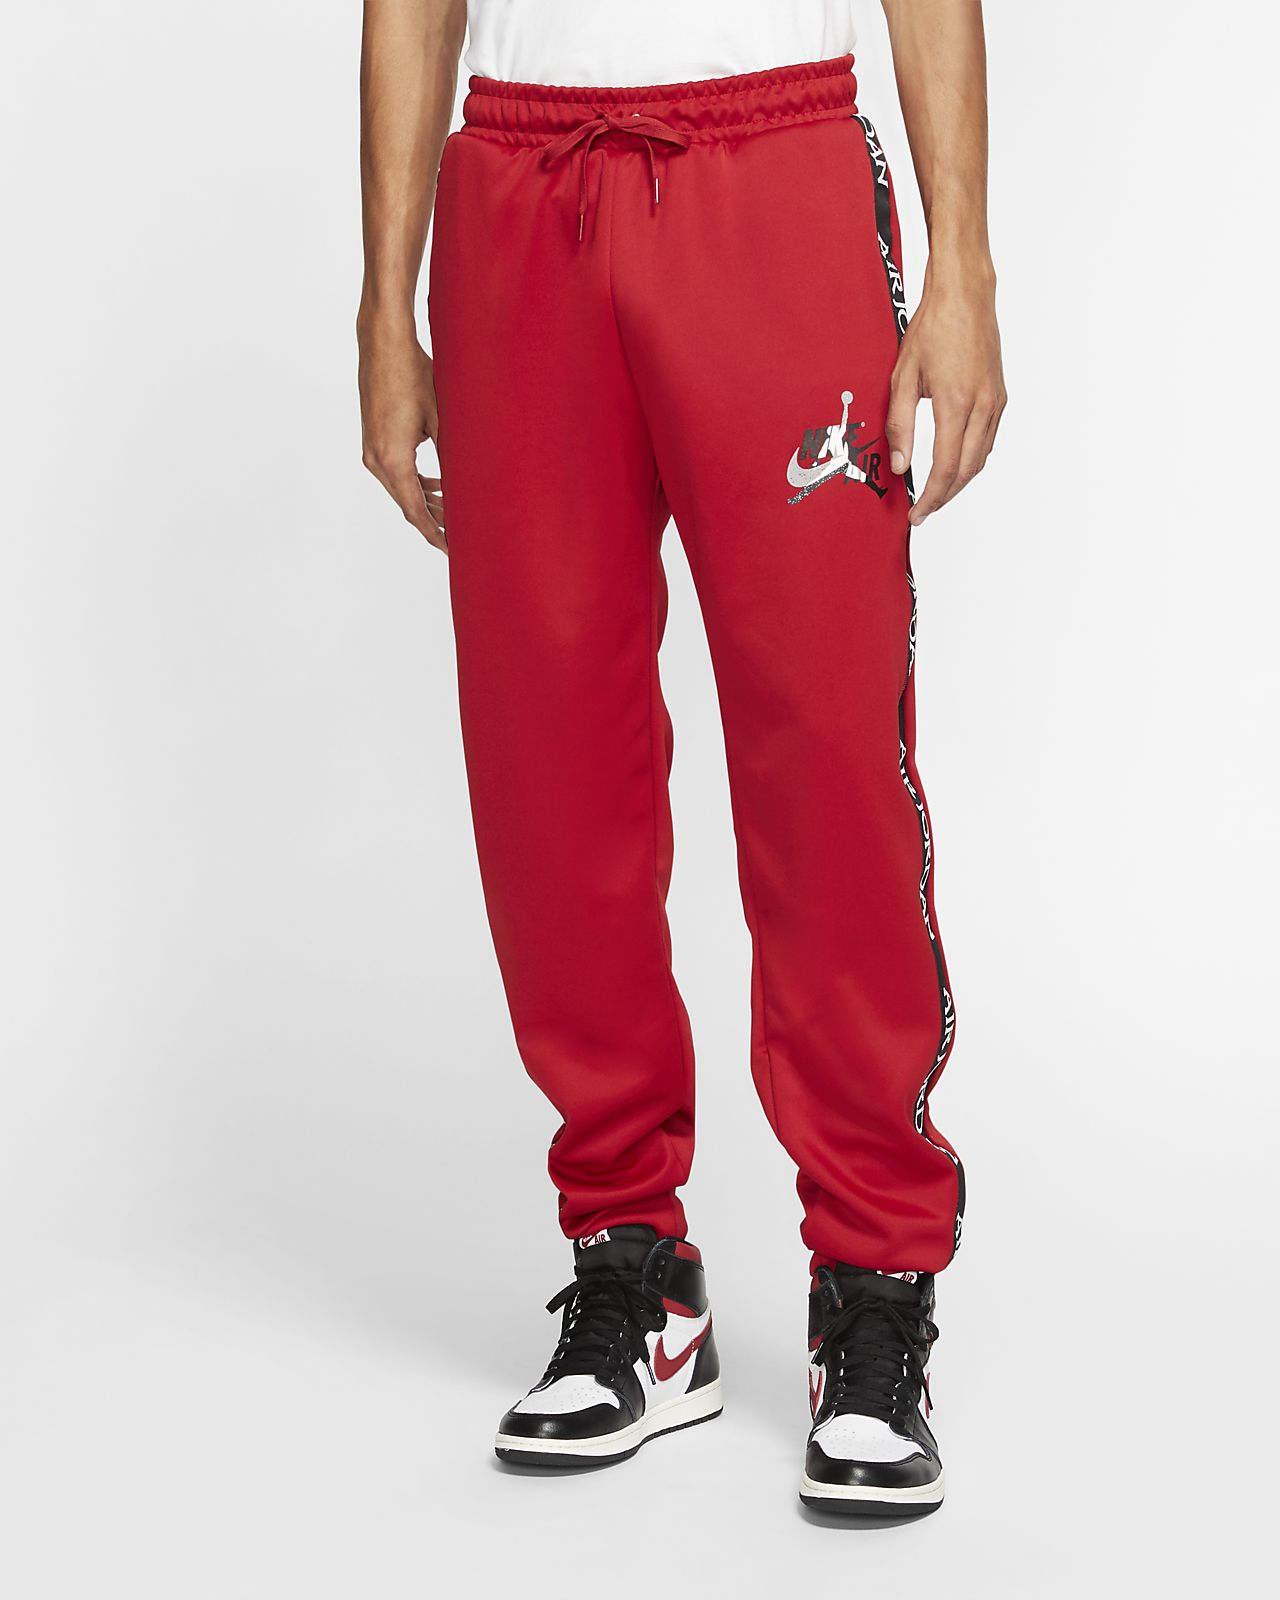 pantalon nike homme rouge